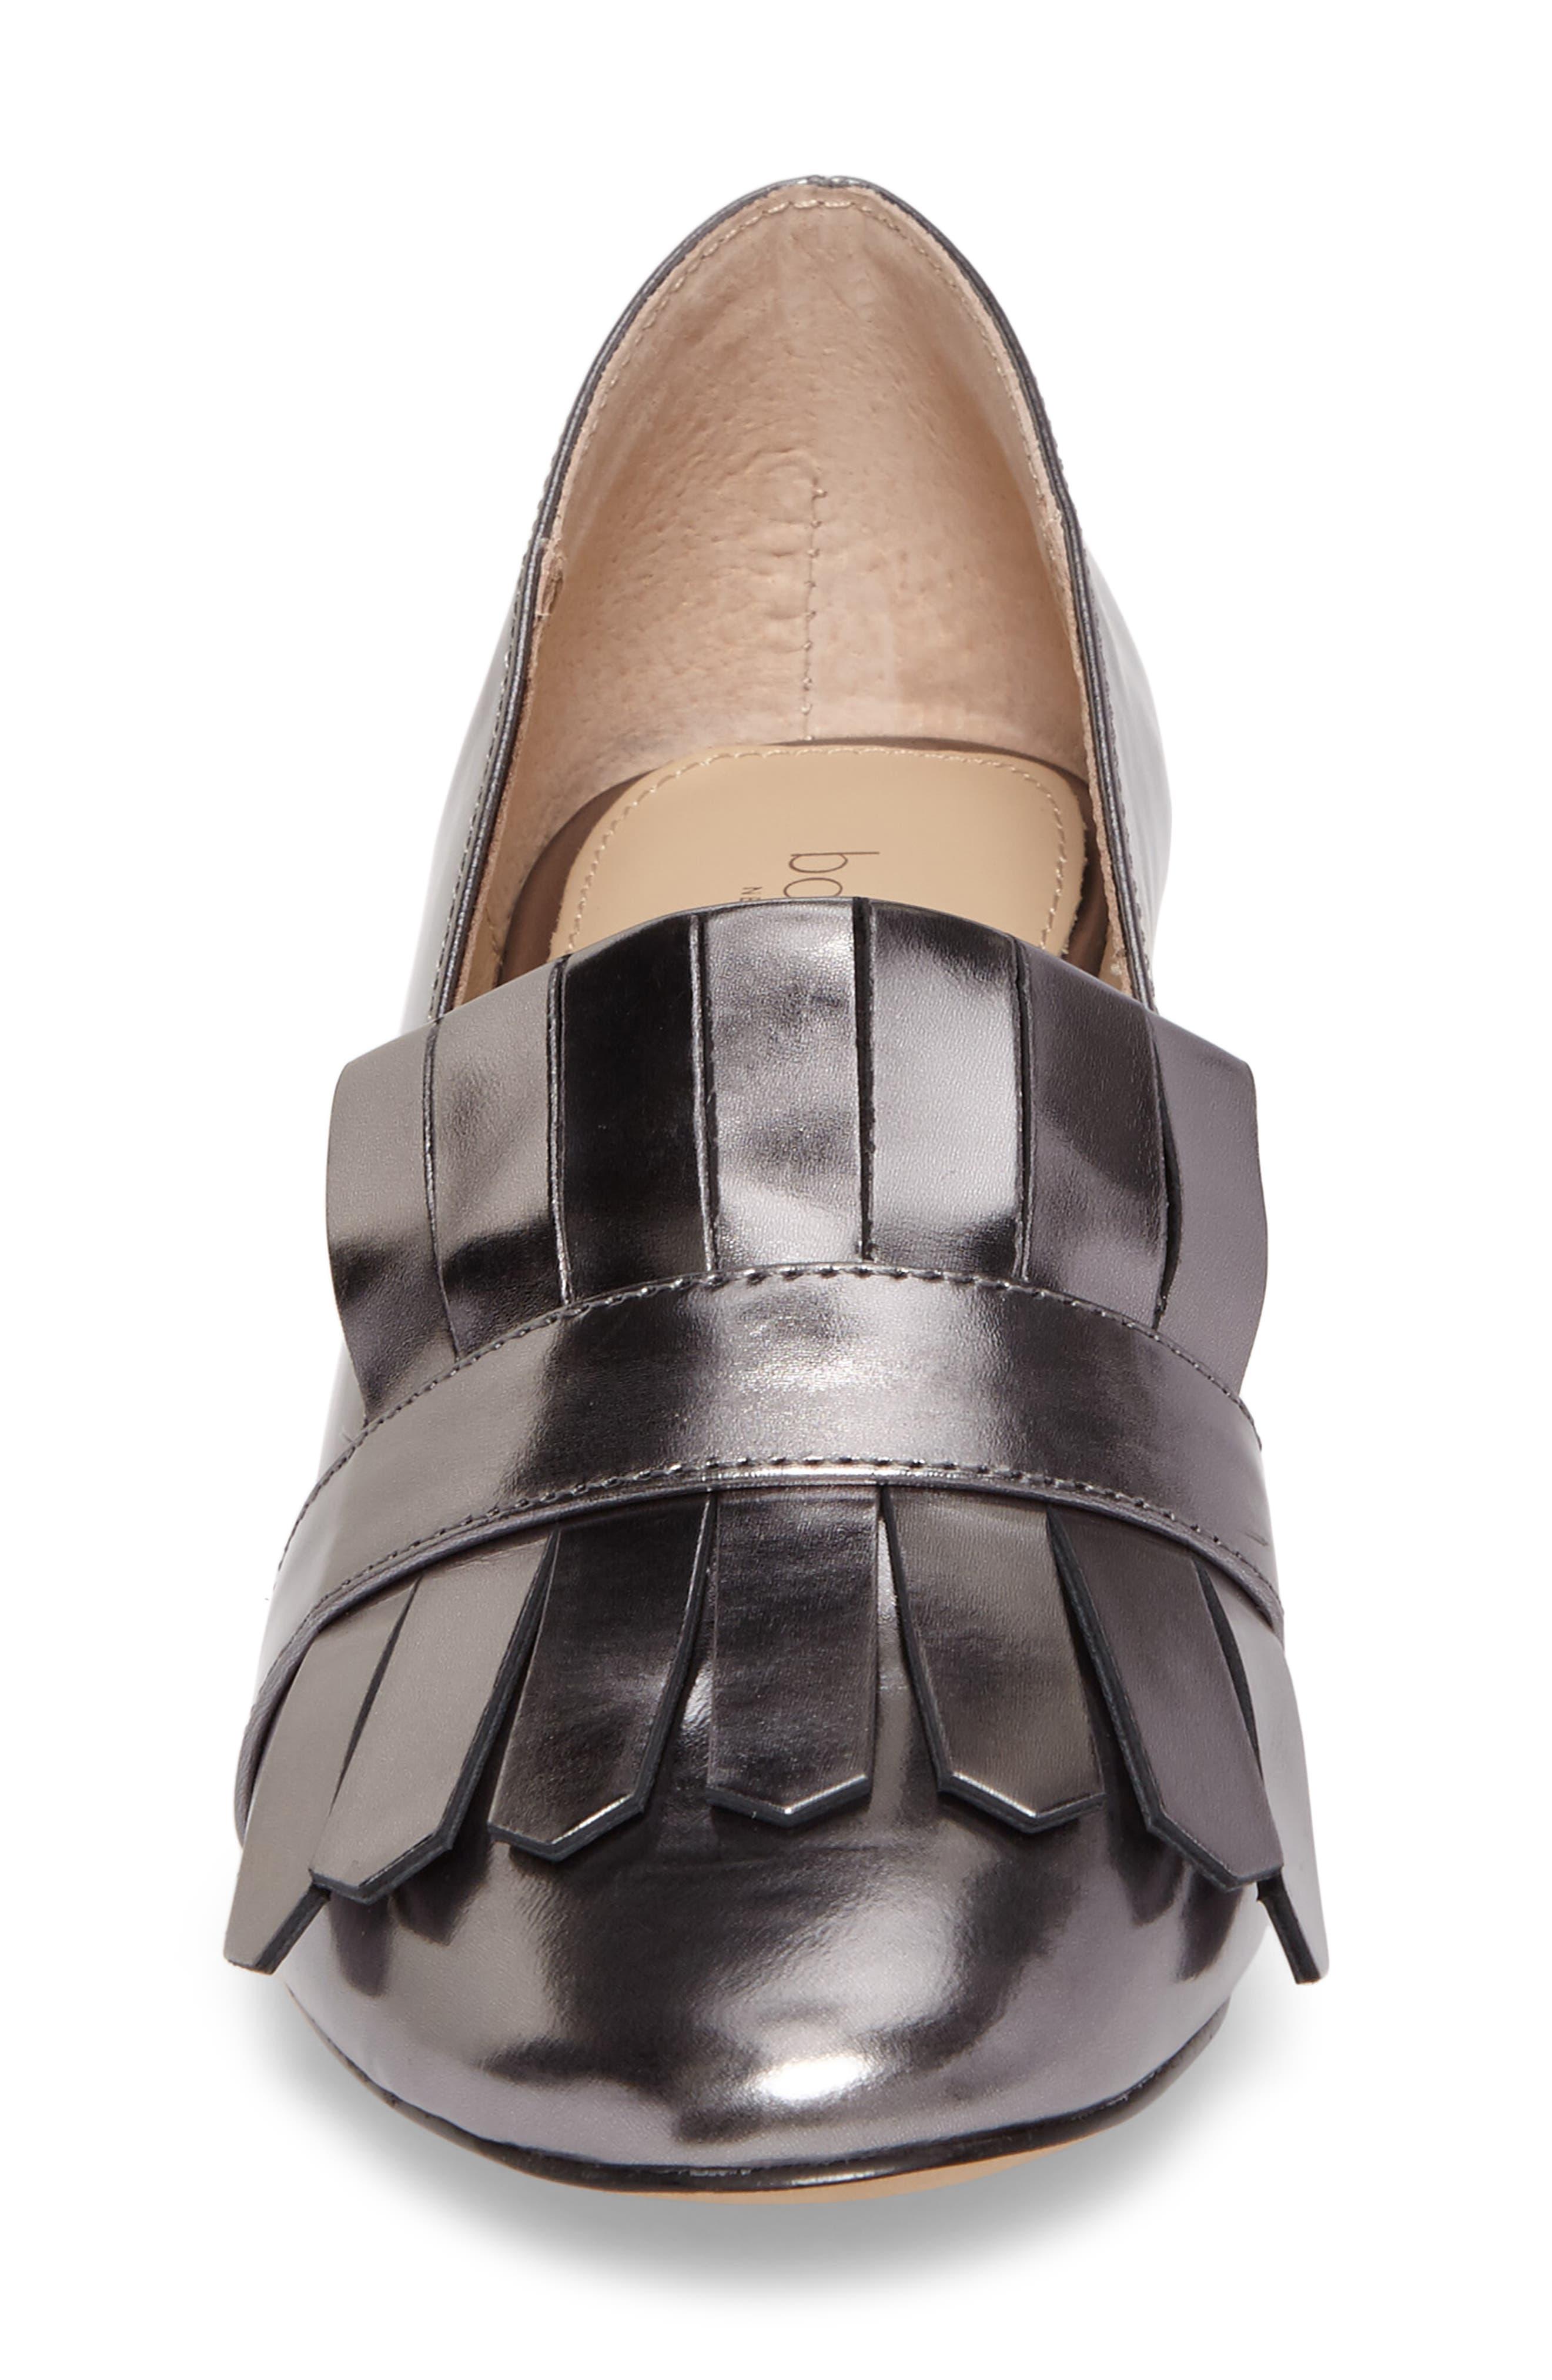 Olive Loafer Pump,                             Alternate thumbnail 4, color,                             Pewter Leather